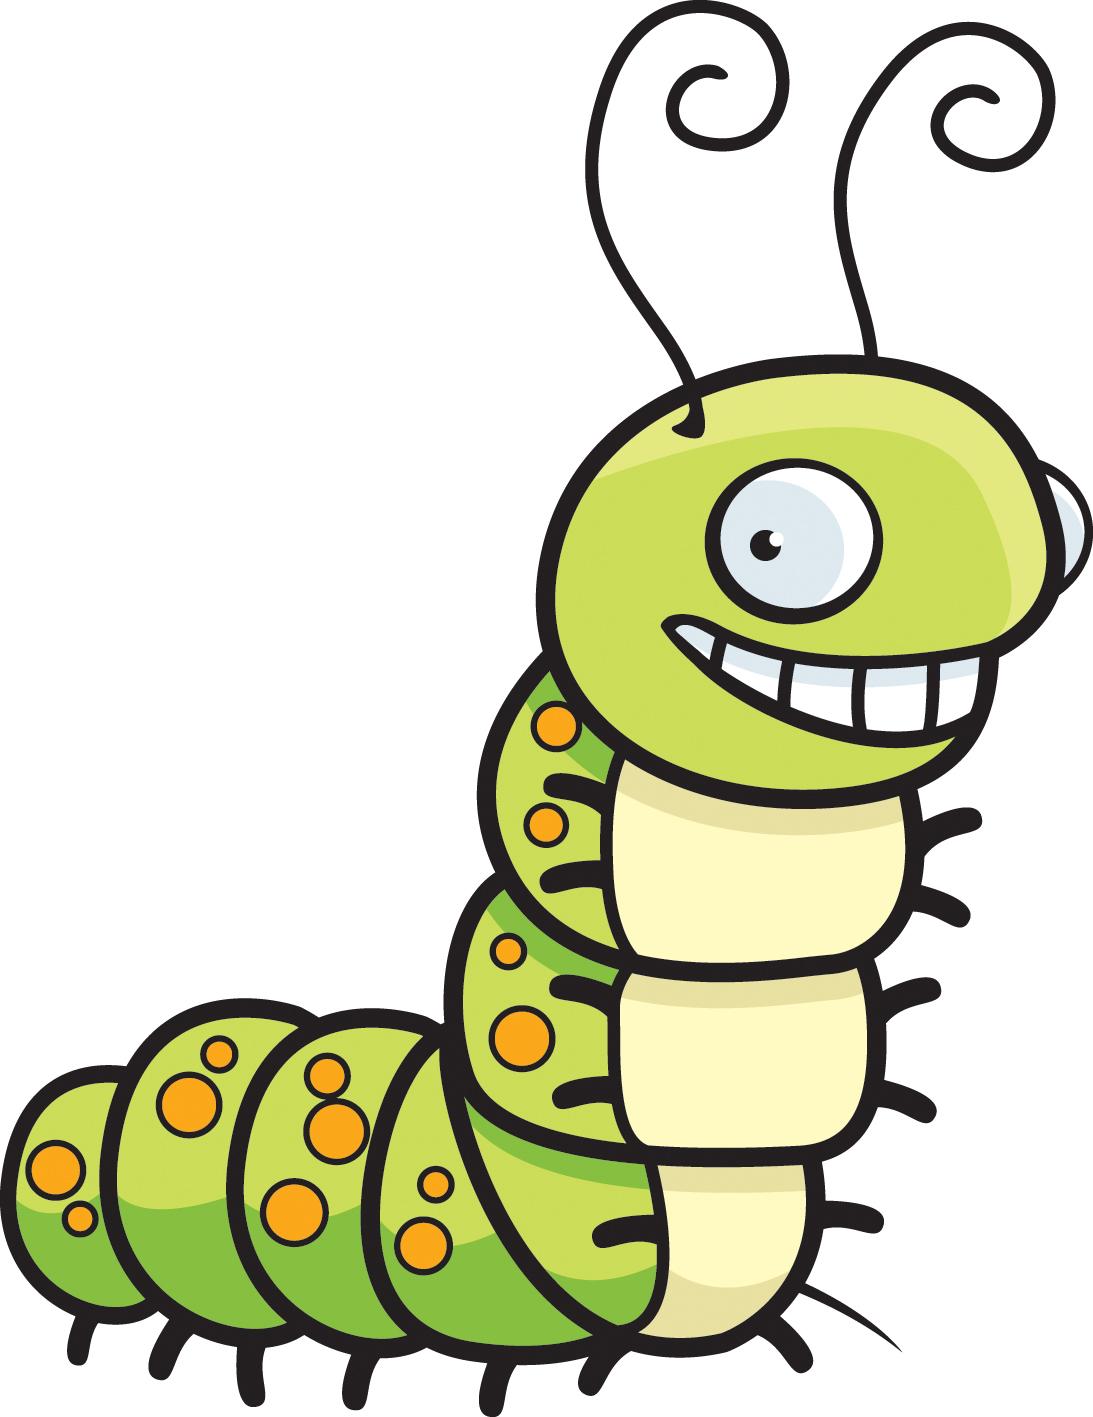 caterpillar cartoon drawing at getdrawings com free for personal rh getdrawings com